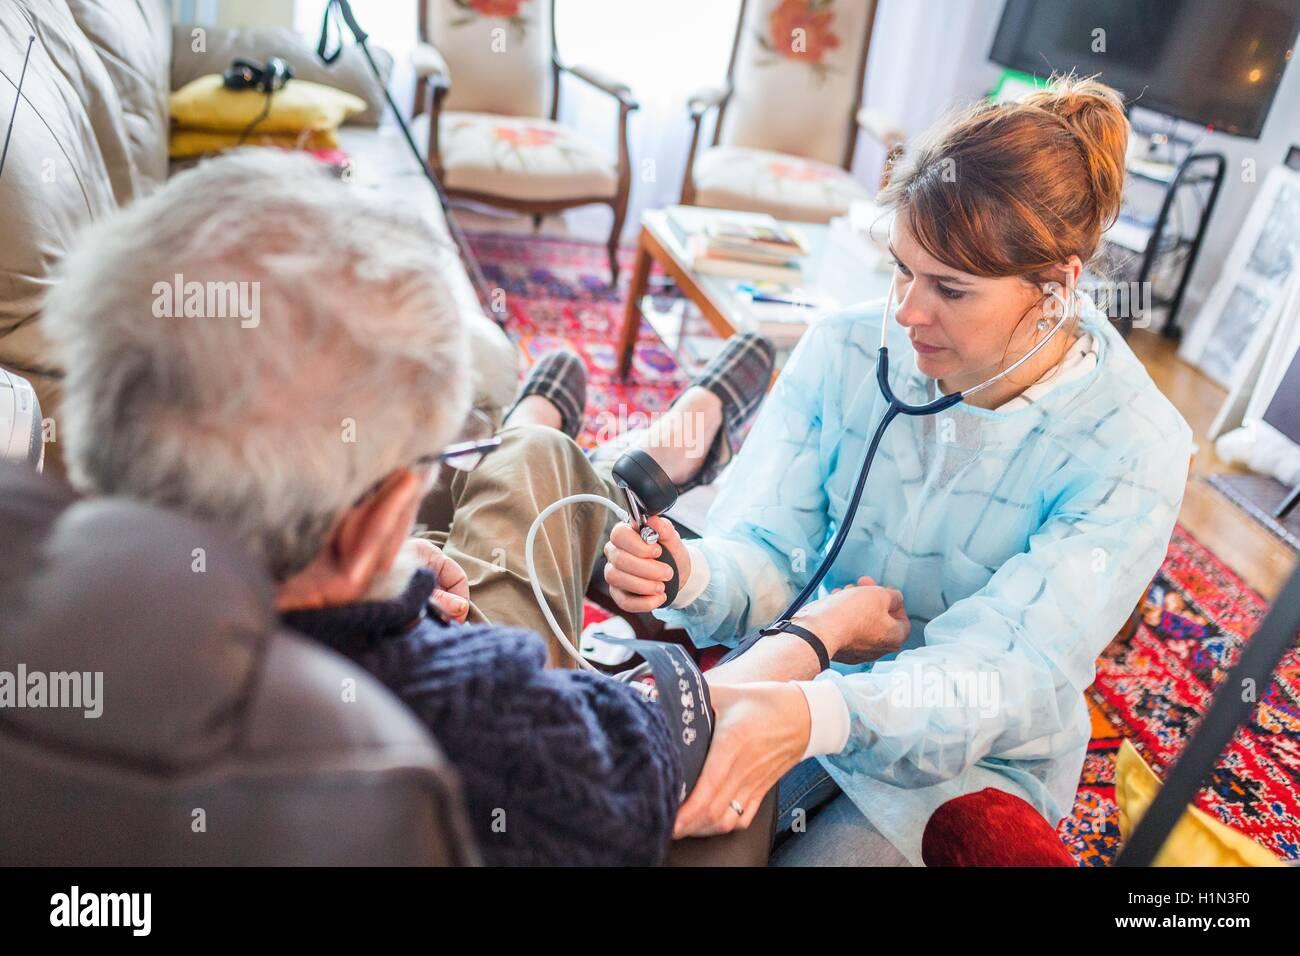 Nurse home visit, blood pressure taking of a patient, Home medical care department of Limoges hospital, France. - Stock Image